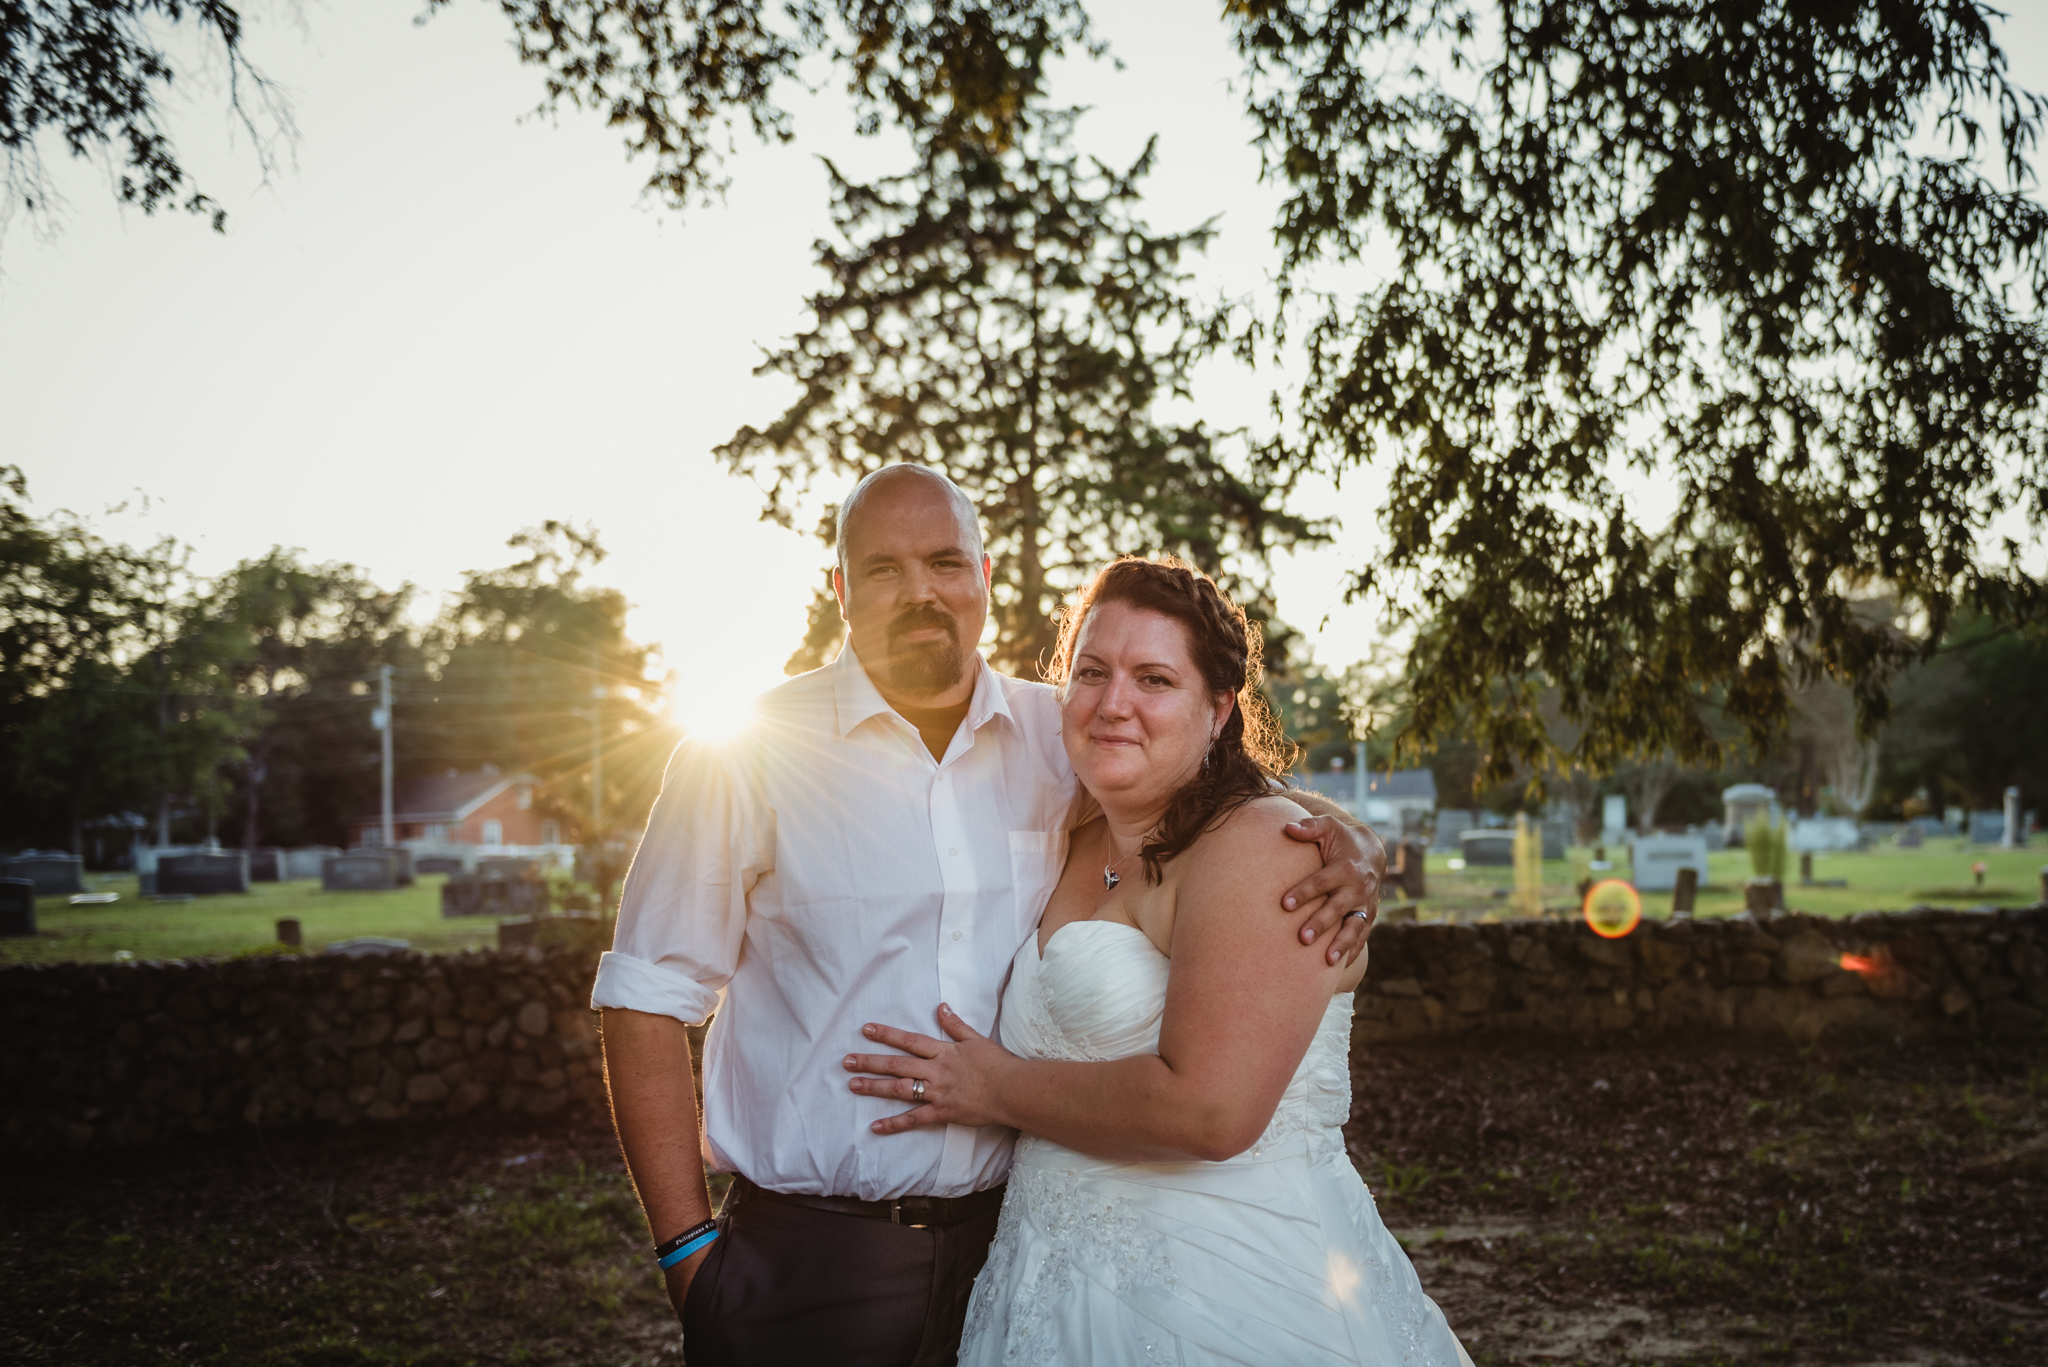 raleigh-wedding-outdoor-reception-bride-and-groom-cd.jpg